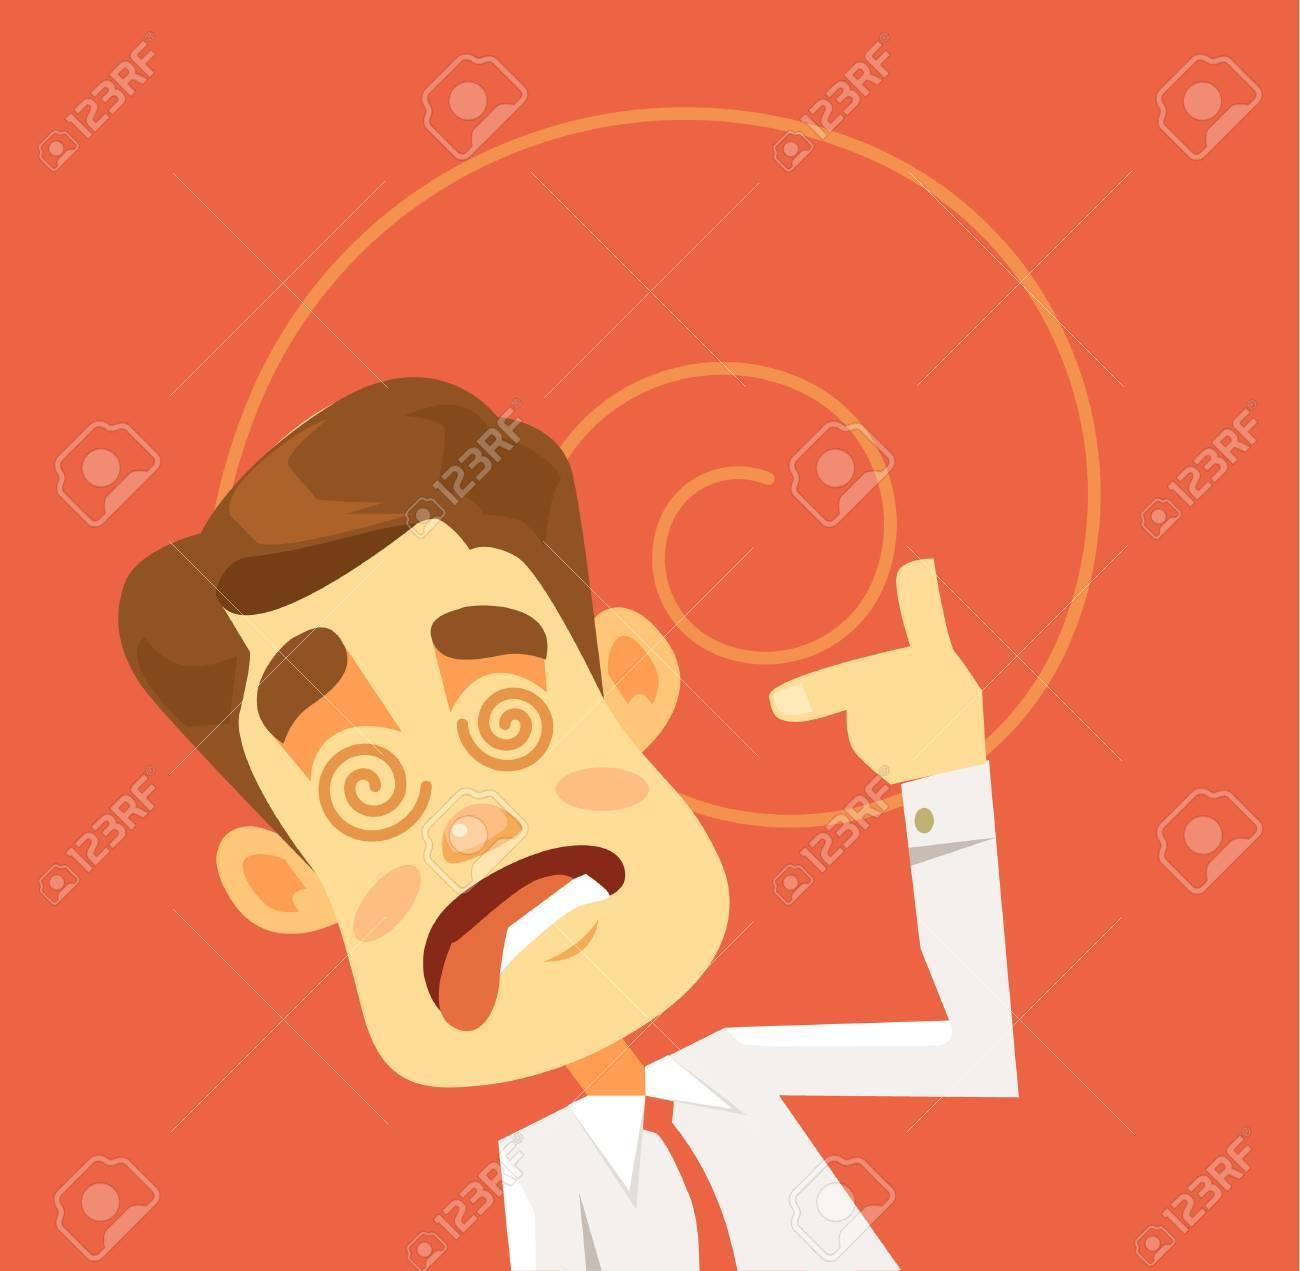 Crazy man character. Hard work. Vector flat cartoon illustration - 60890126